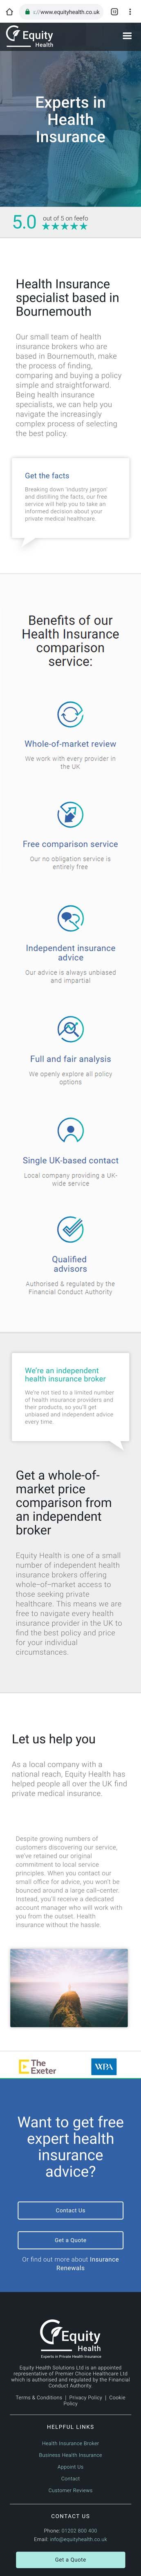 Insurance industry mobile website design